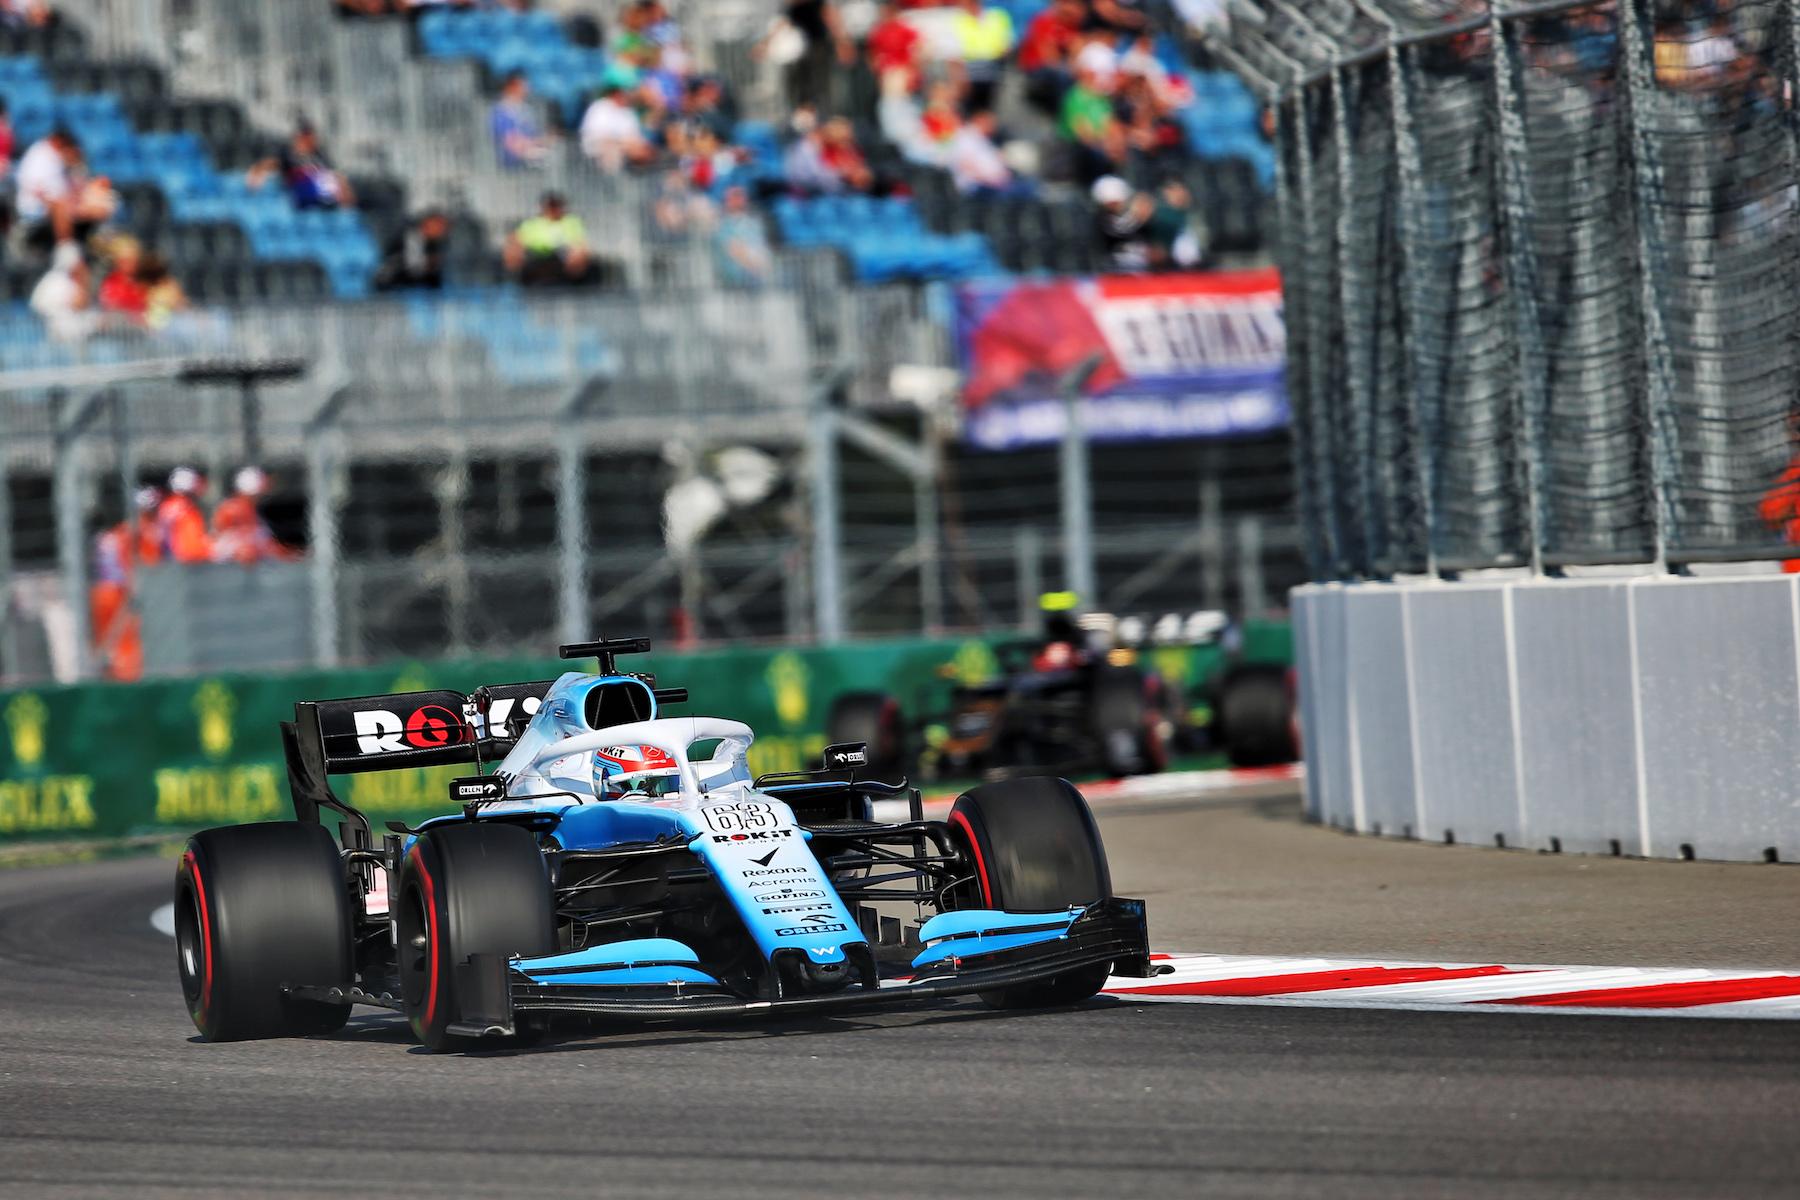 3 2019 Russian GP Saturday 20.jpg